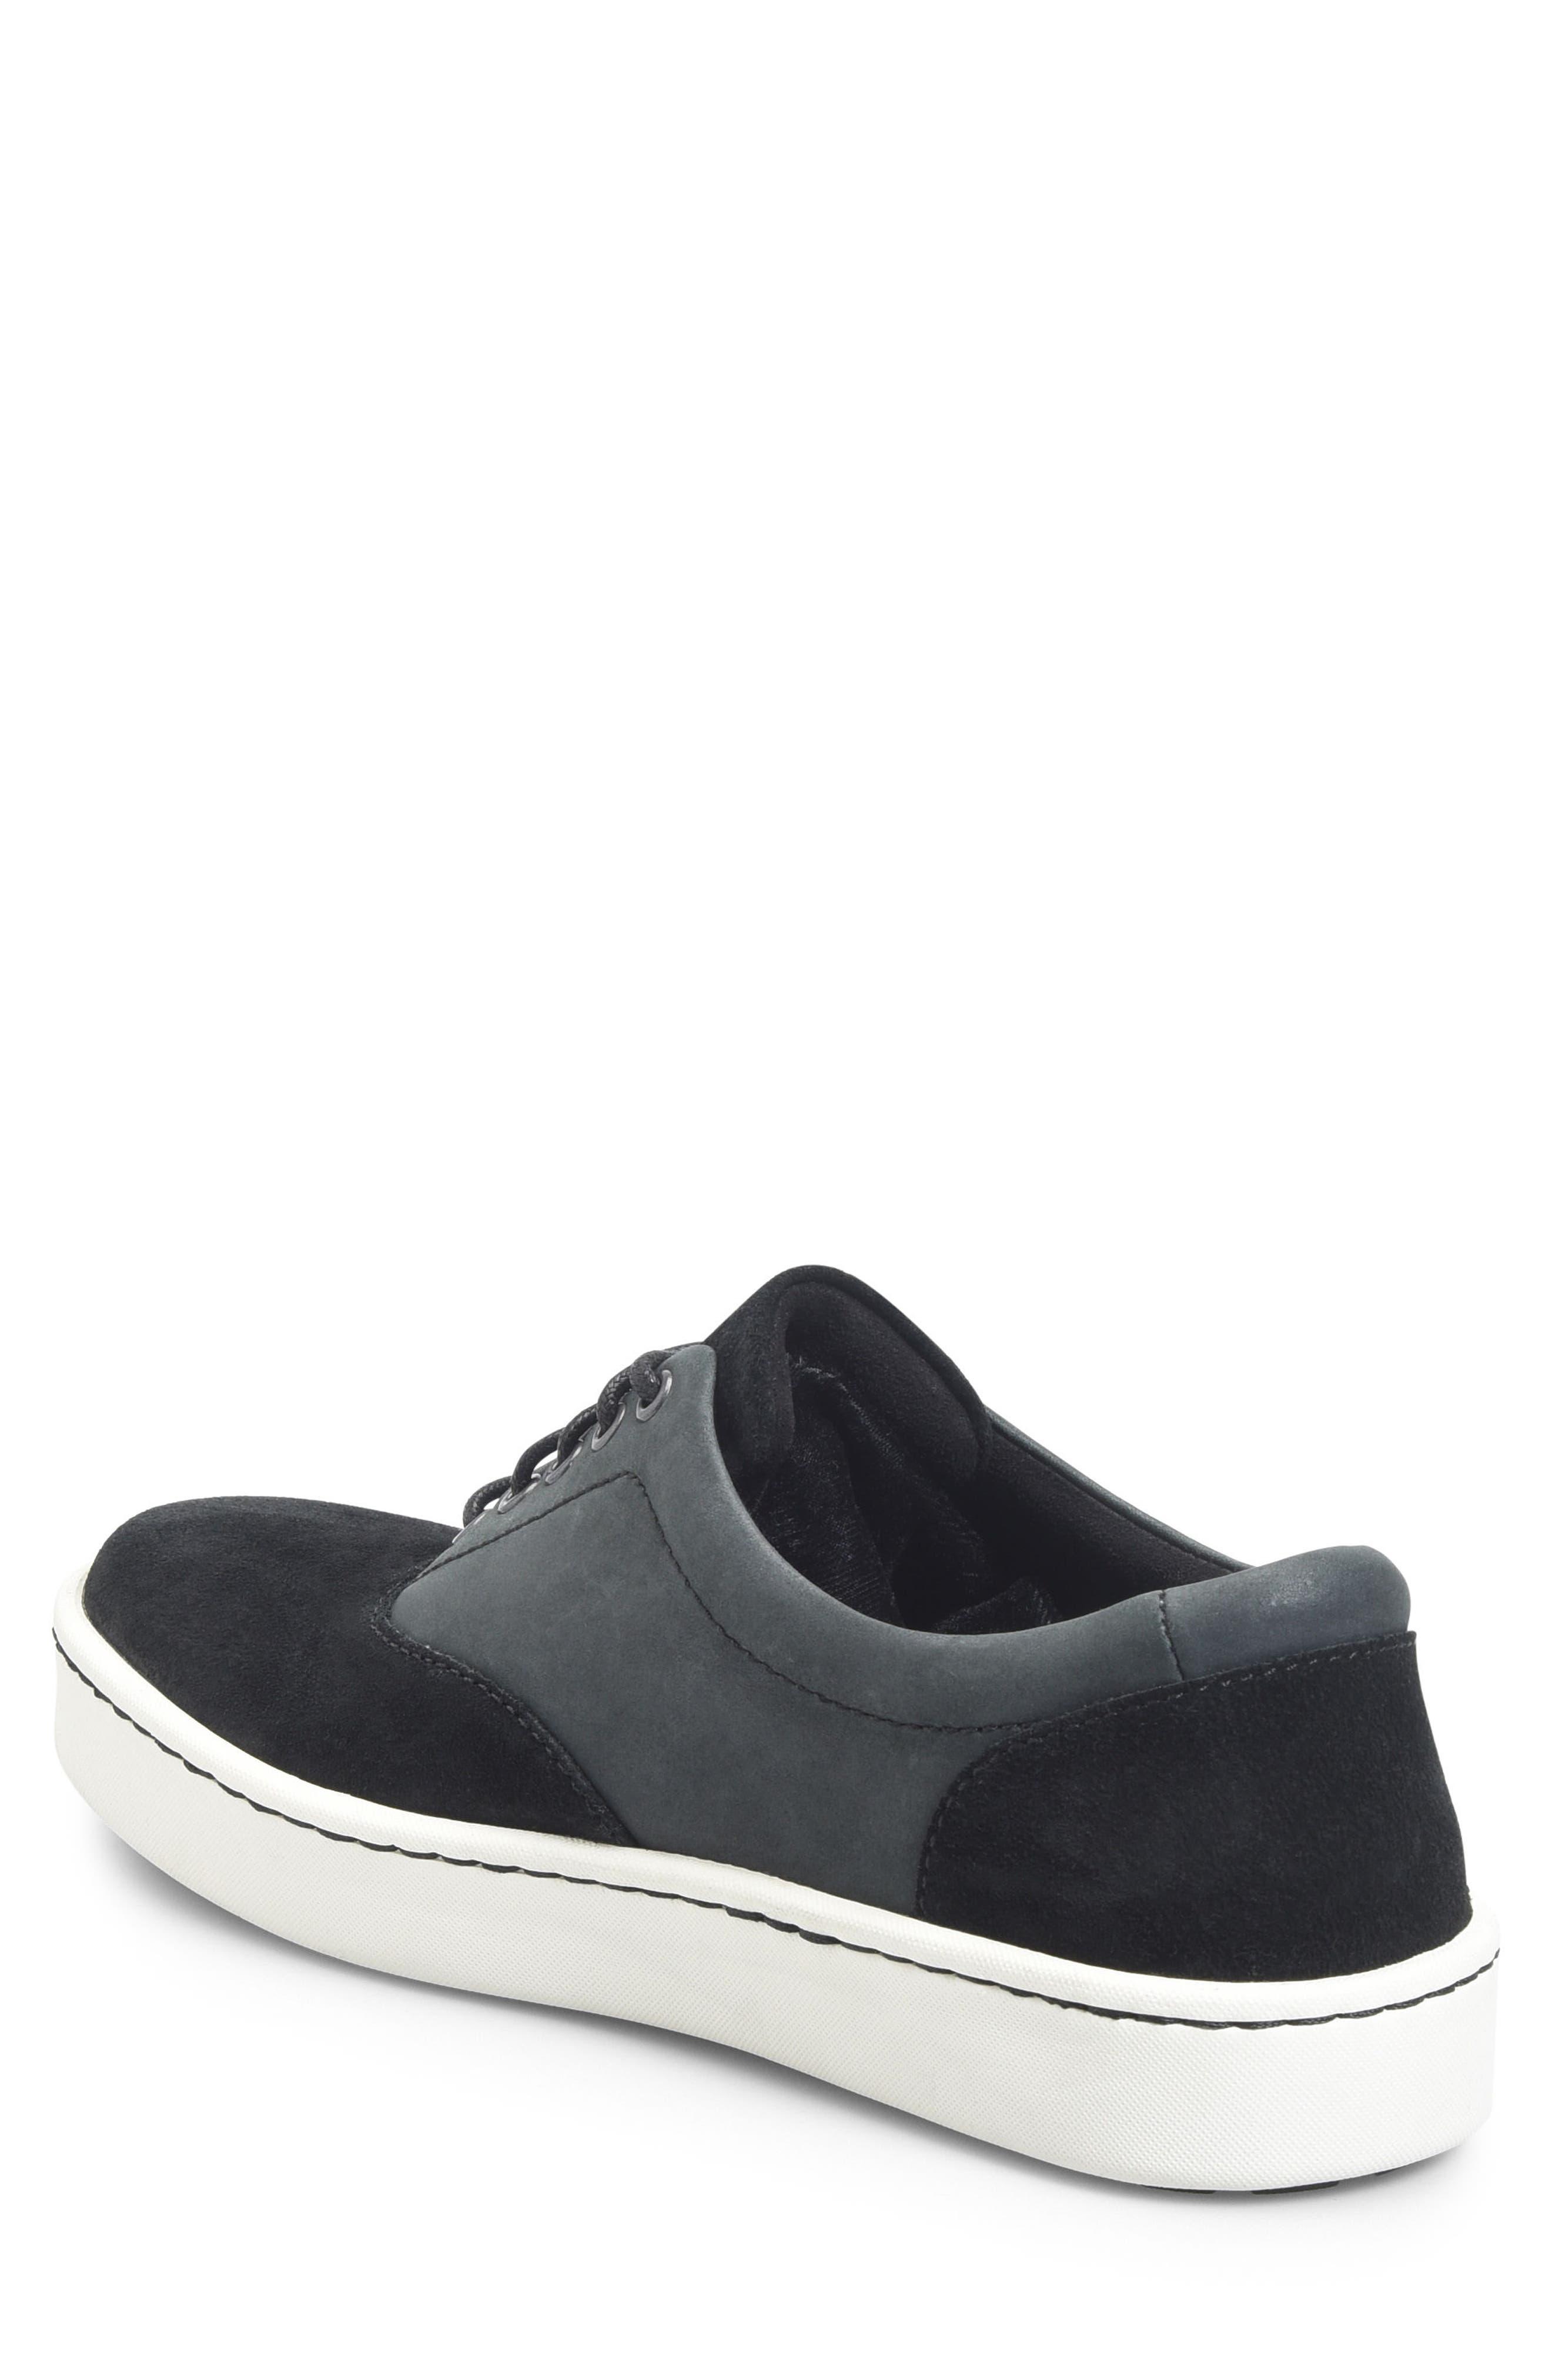 Keystone Low Top Sneaker,                             Alternate thumbnail 2, color,                             001